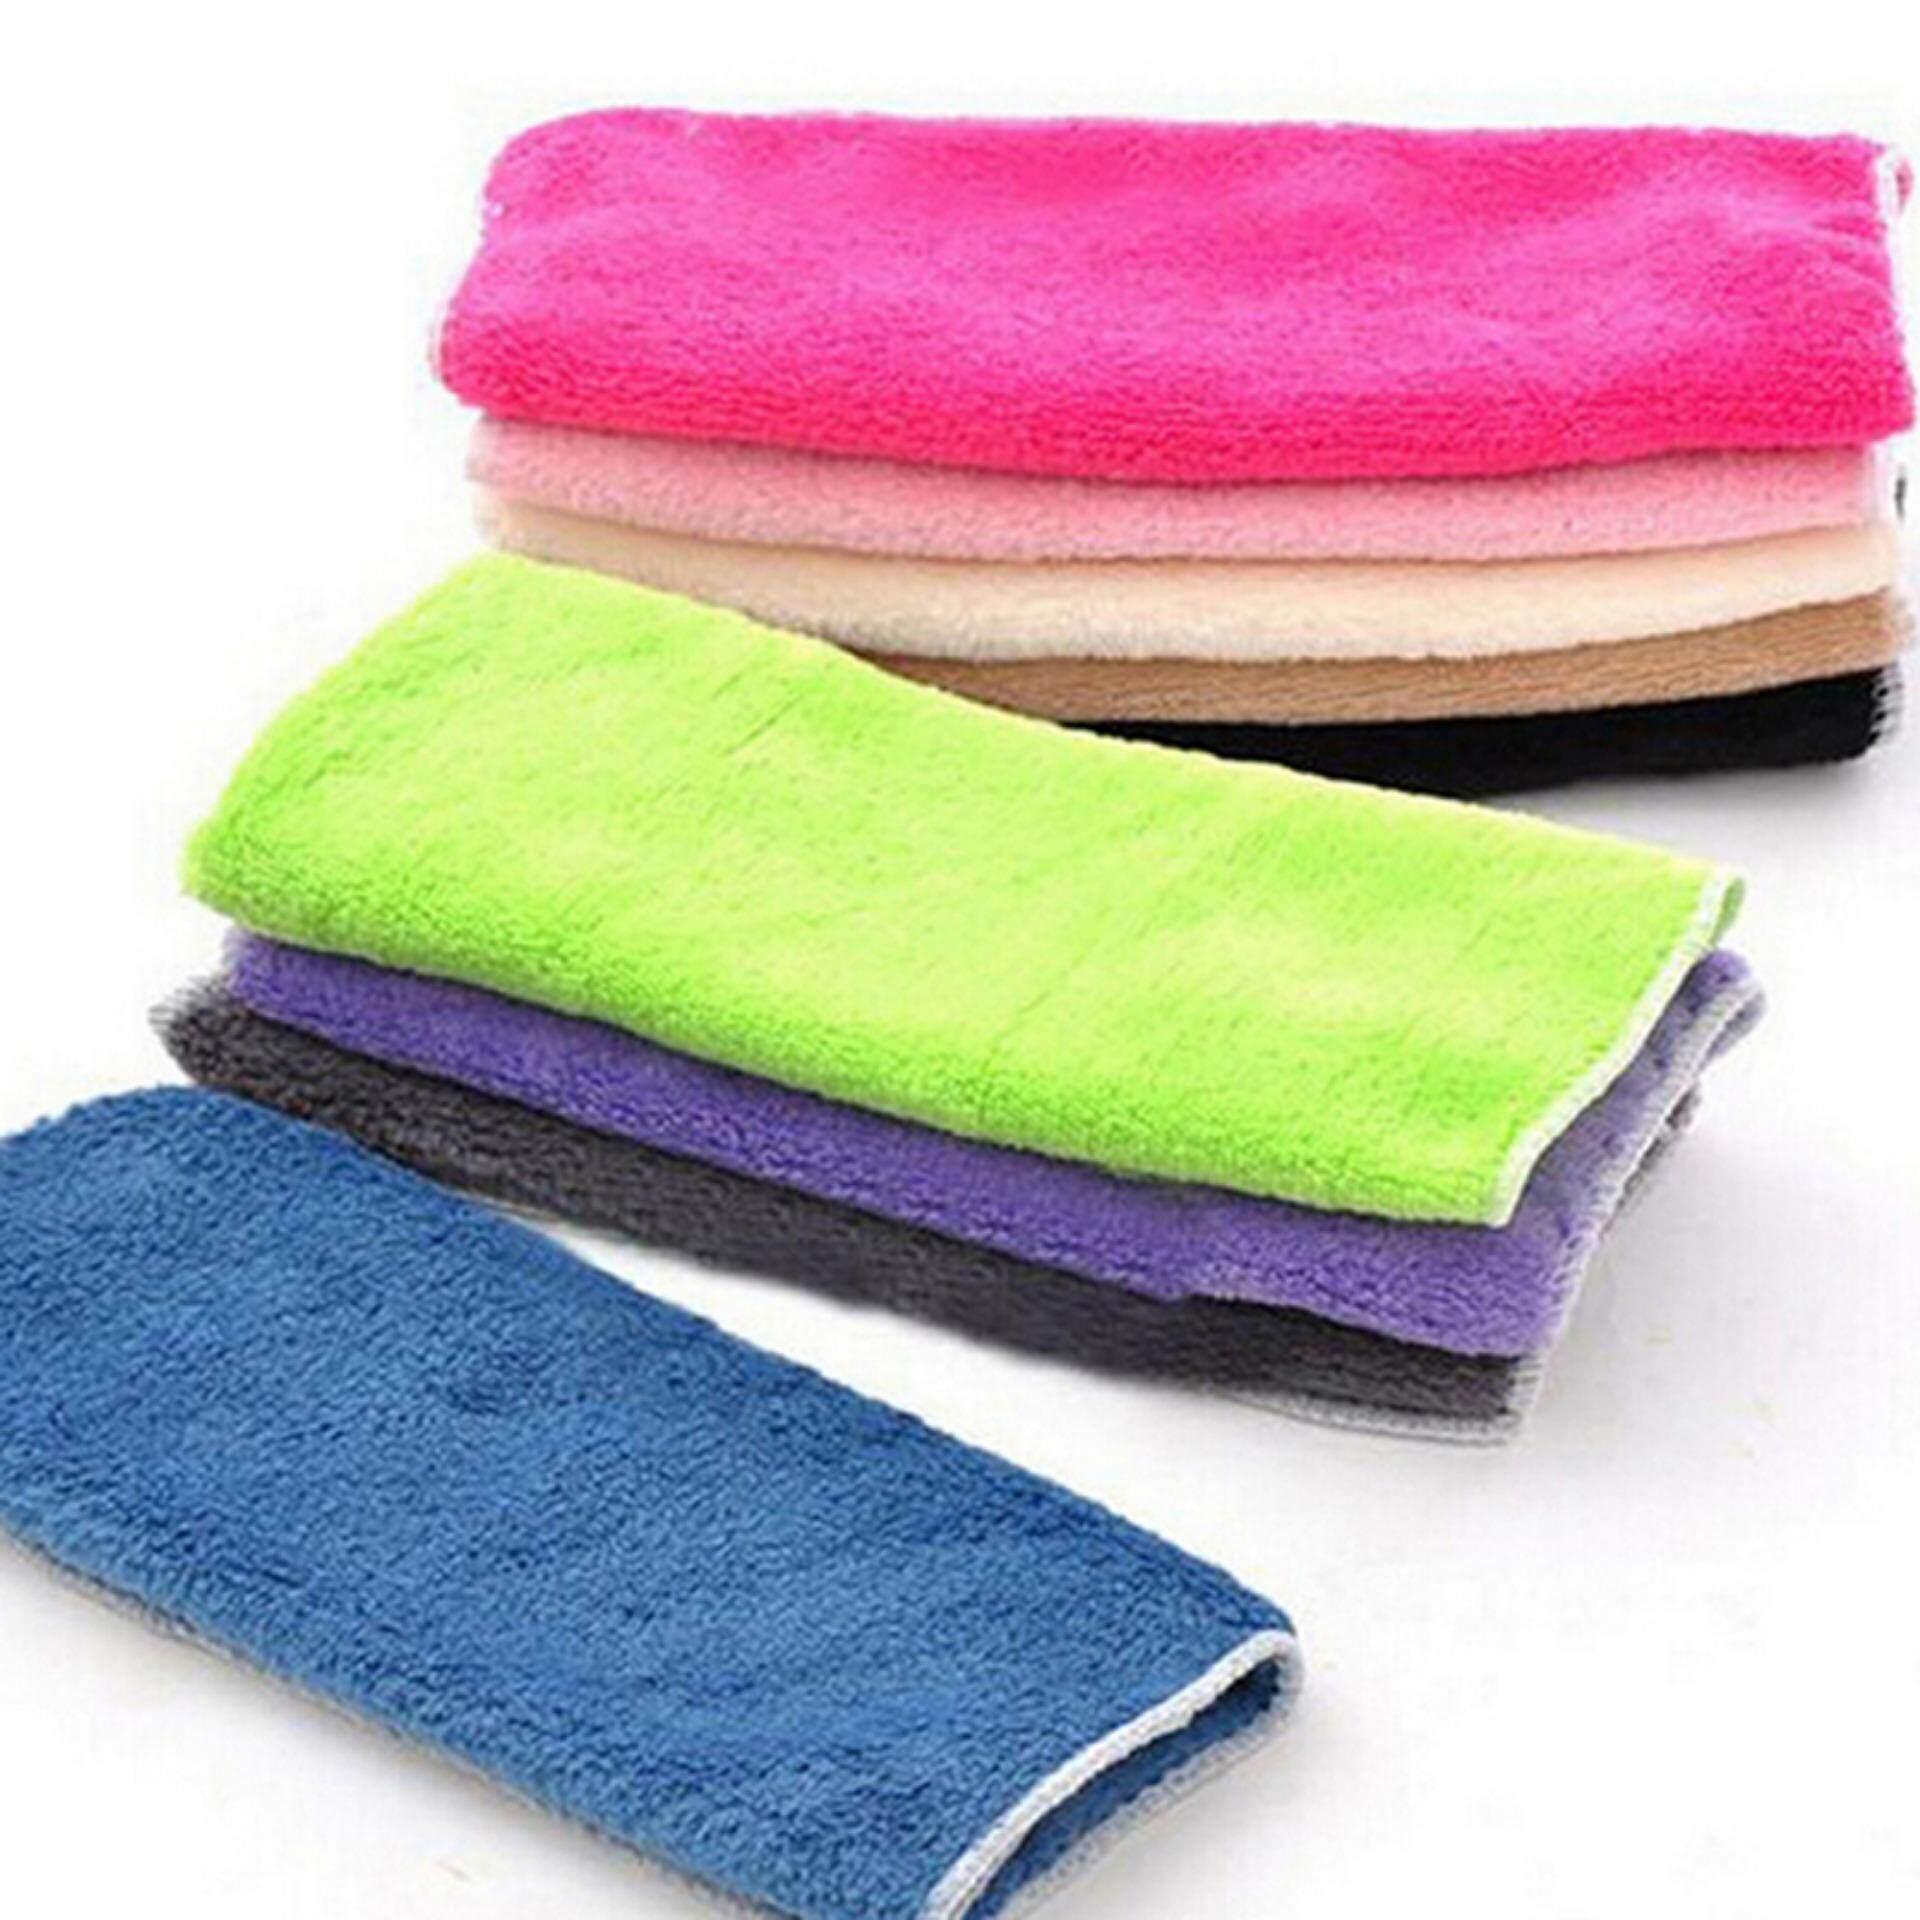 5pcs Bamboo Fiber Dish Towel Cloths 25 25cm Kitchen Hang Dishcloth Cleaning